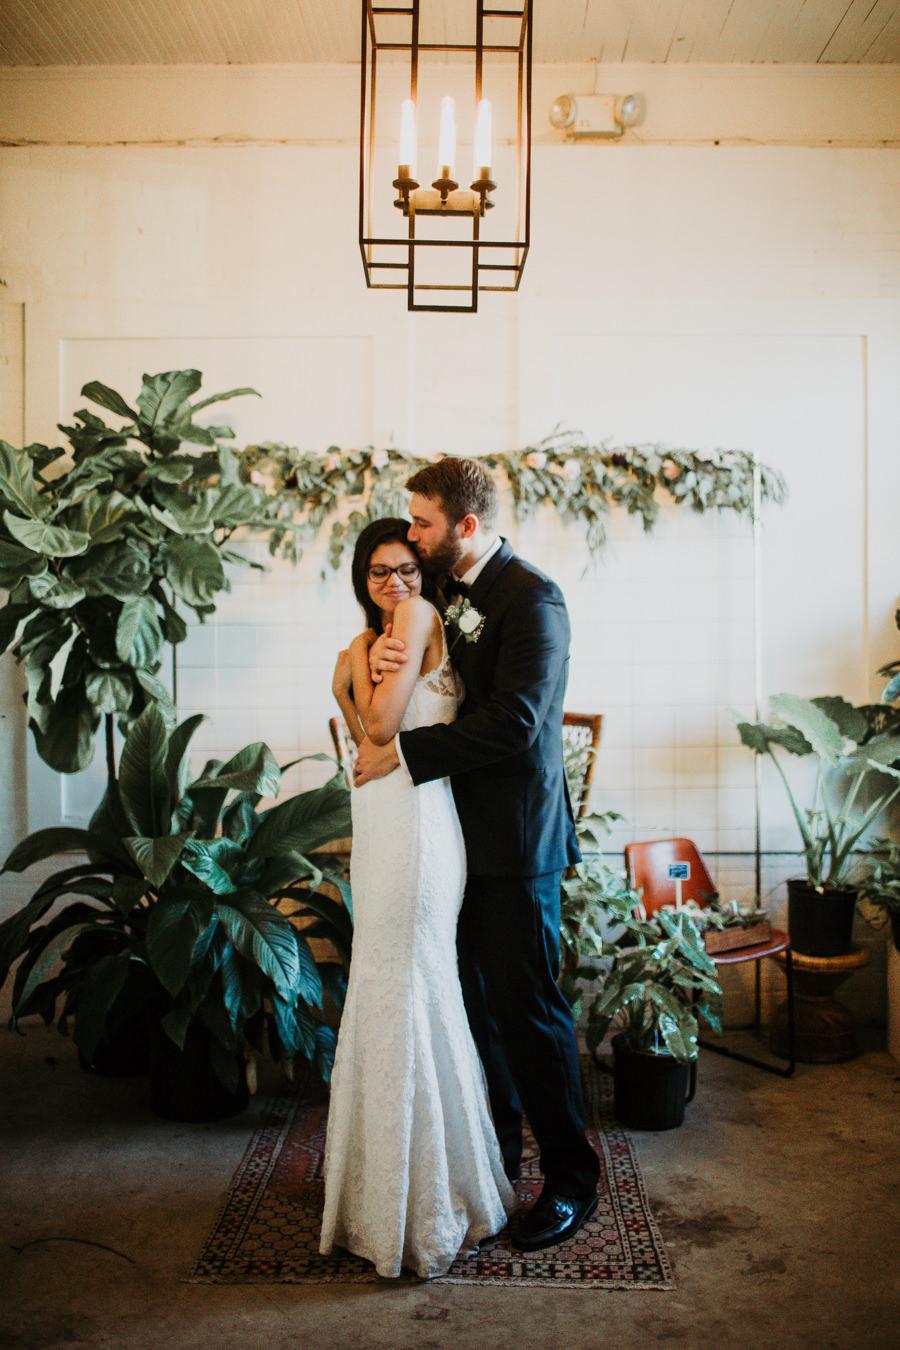 Tampa Heights Industrial Wedding at Cavu Emmy RJ-170.jpg